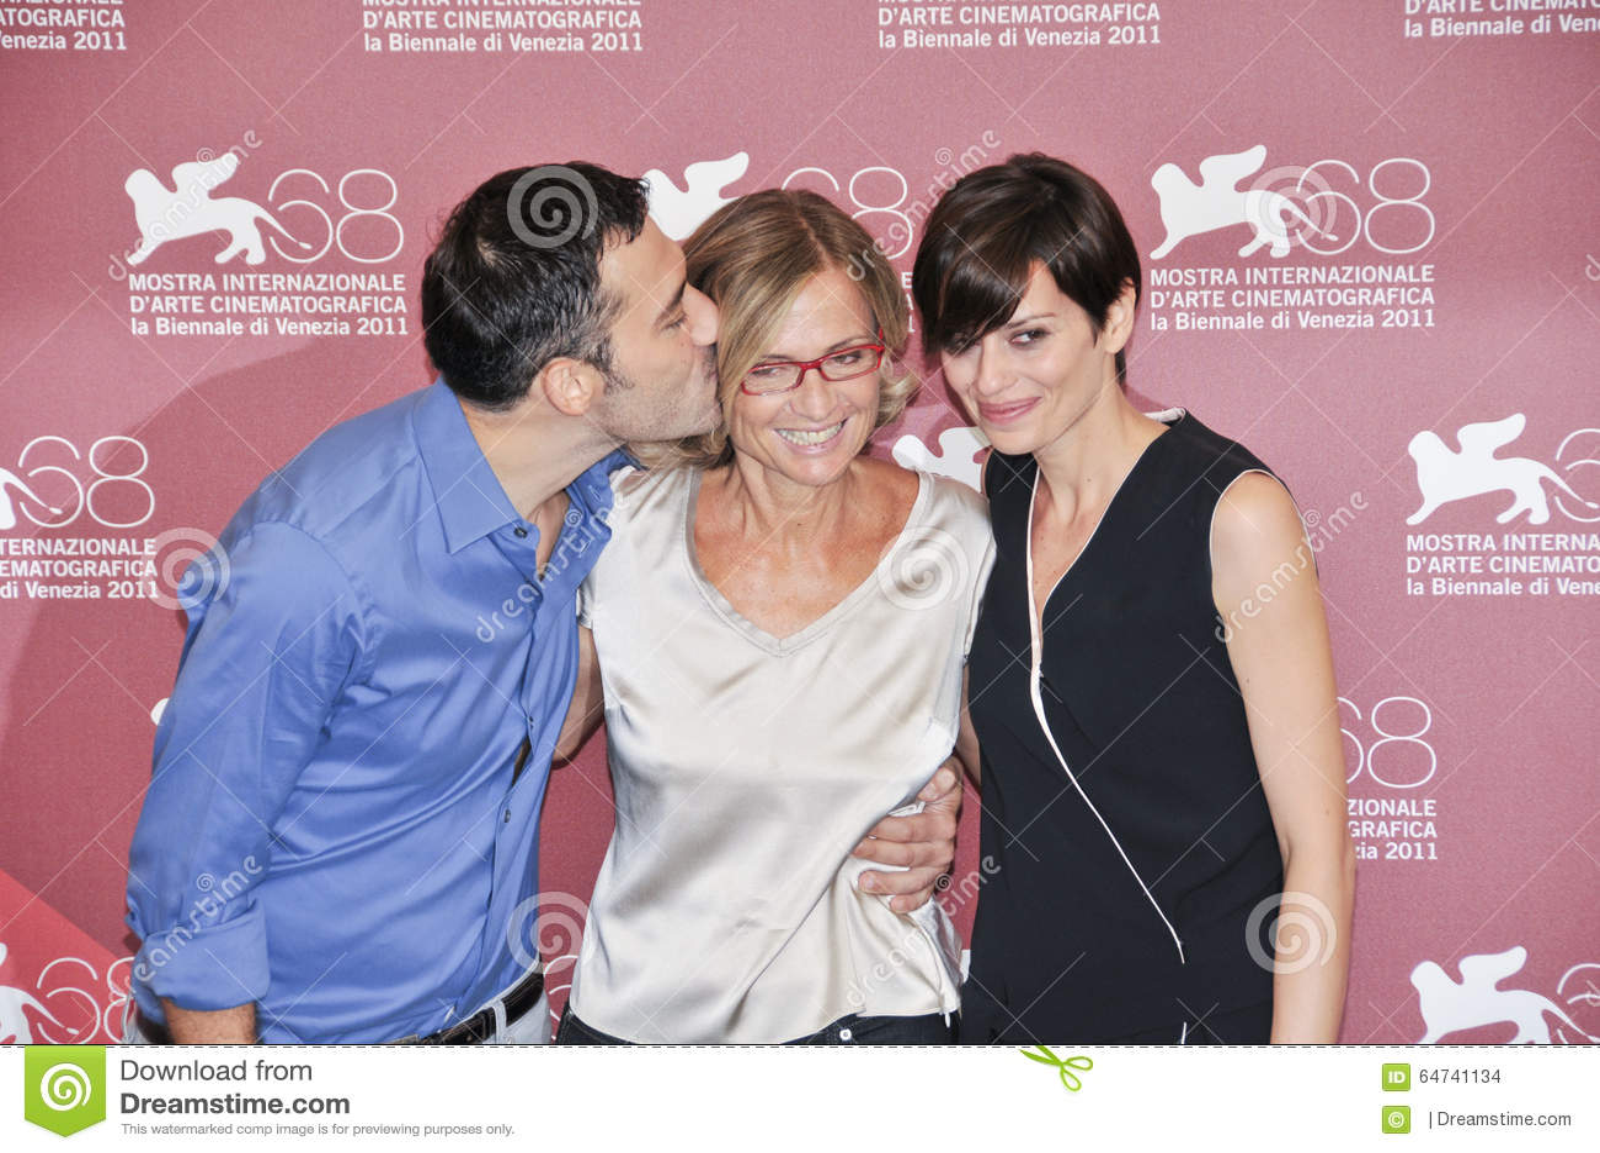 Actores Filippo Timi, Cristina Comencini y Claudia Pandolfi